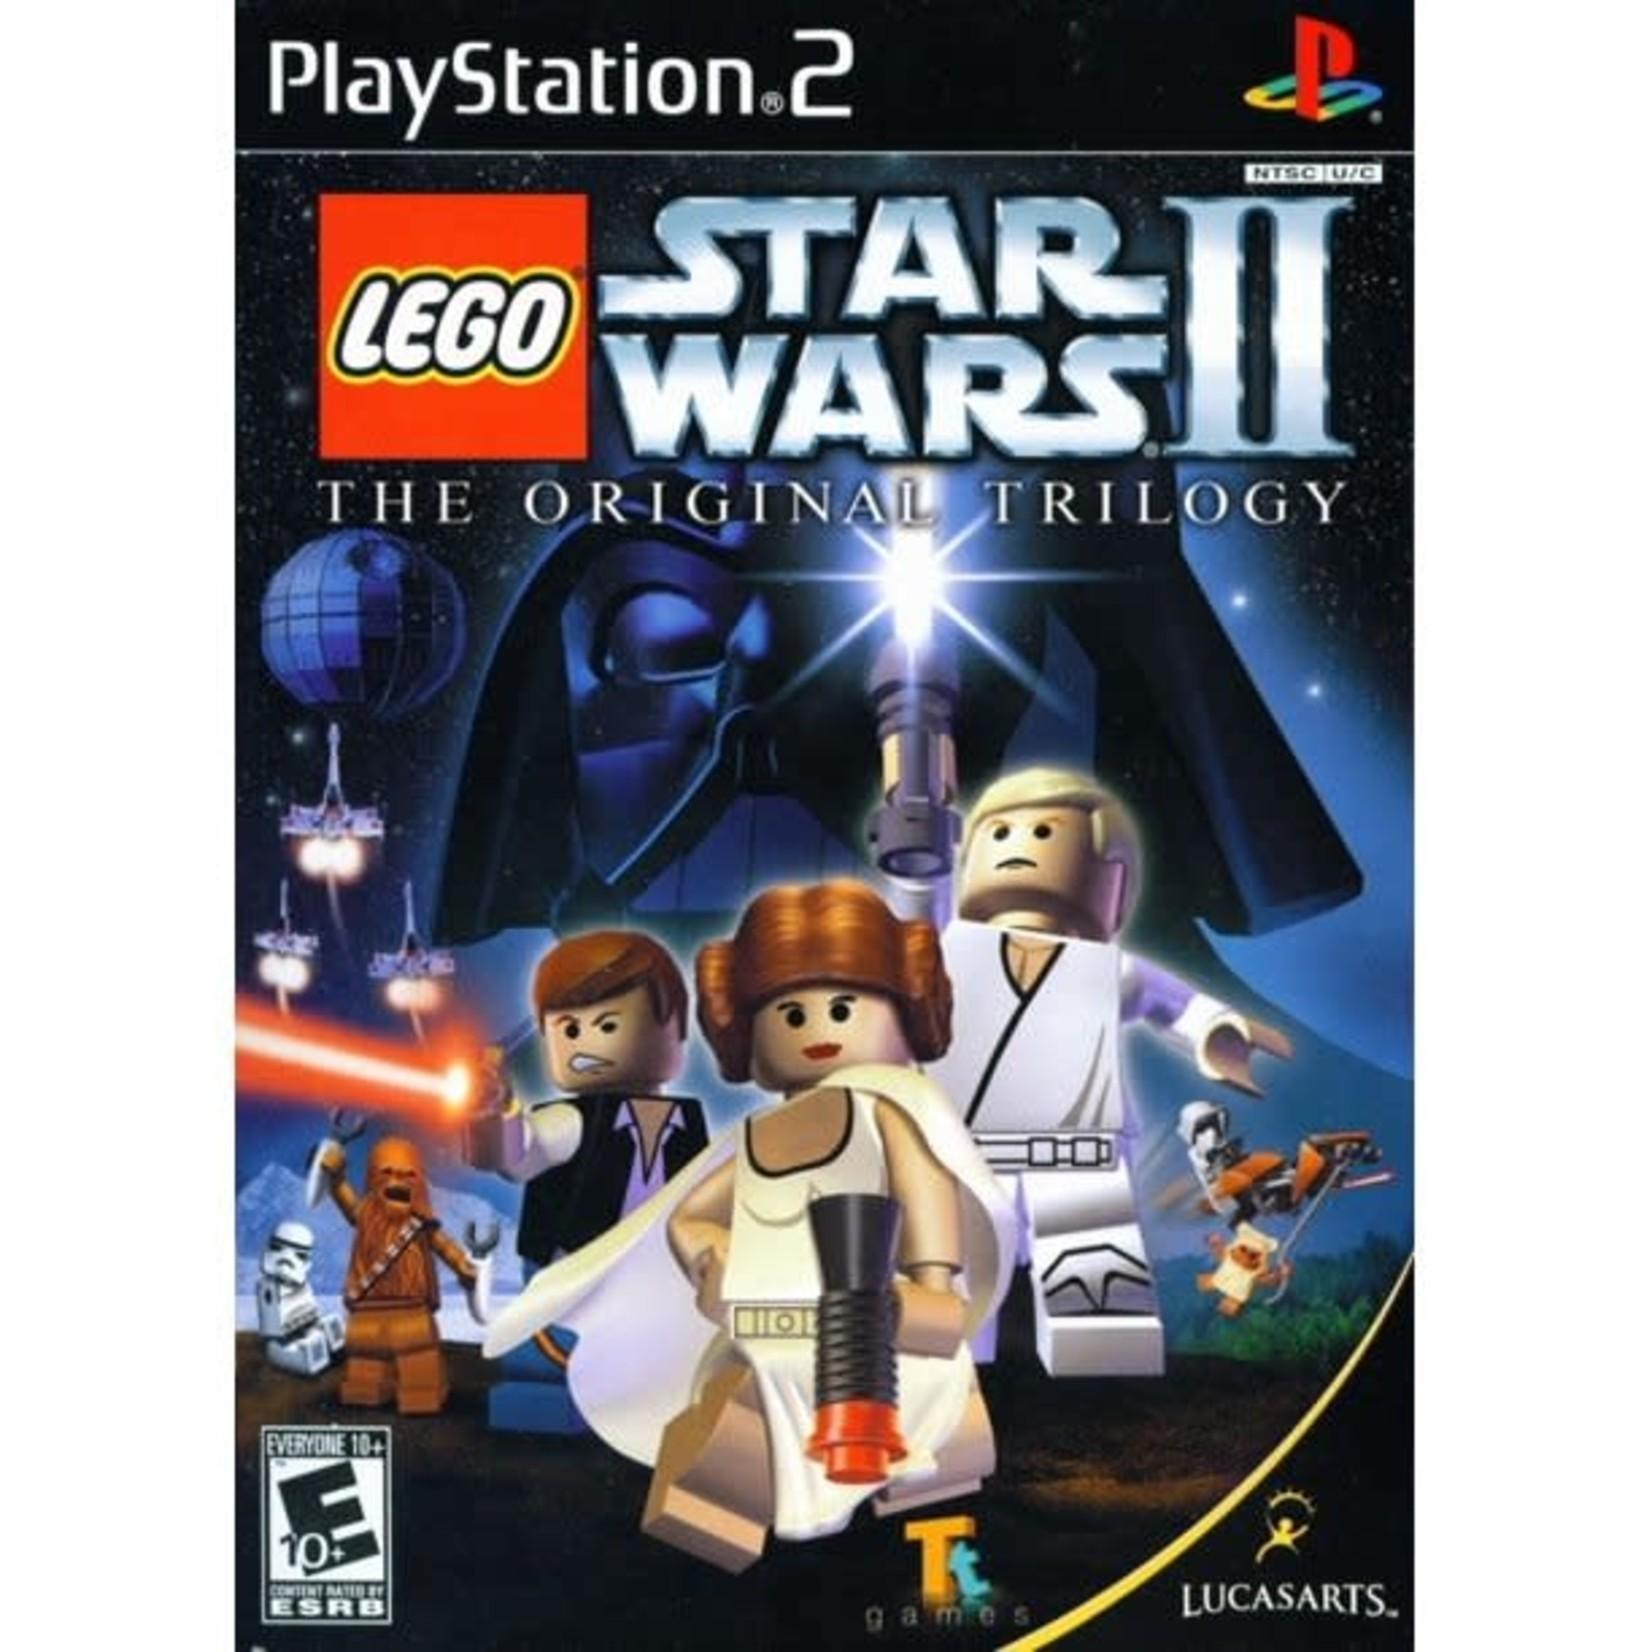 PS2U-LEGO STAR WARS II ORIGINAL TRILOGY